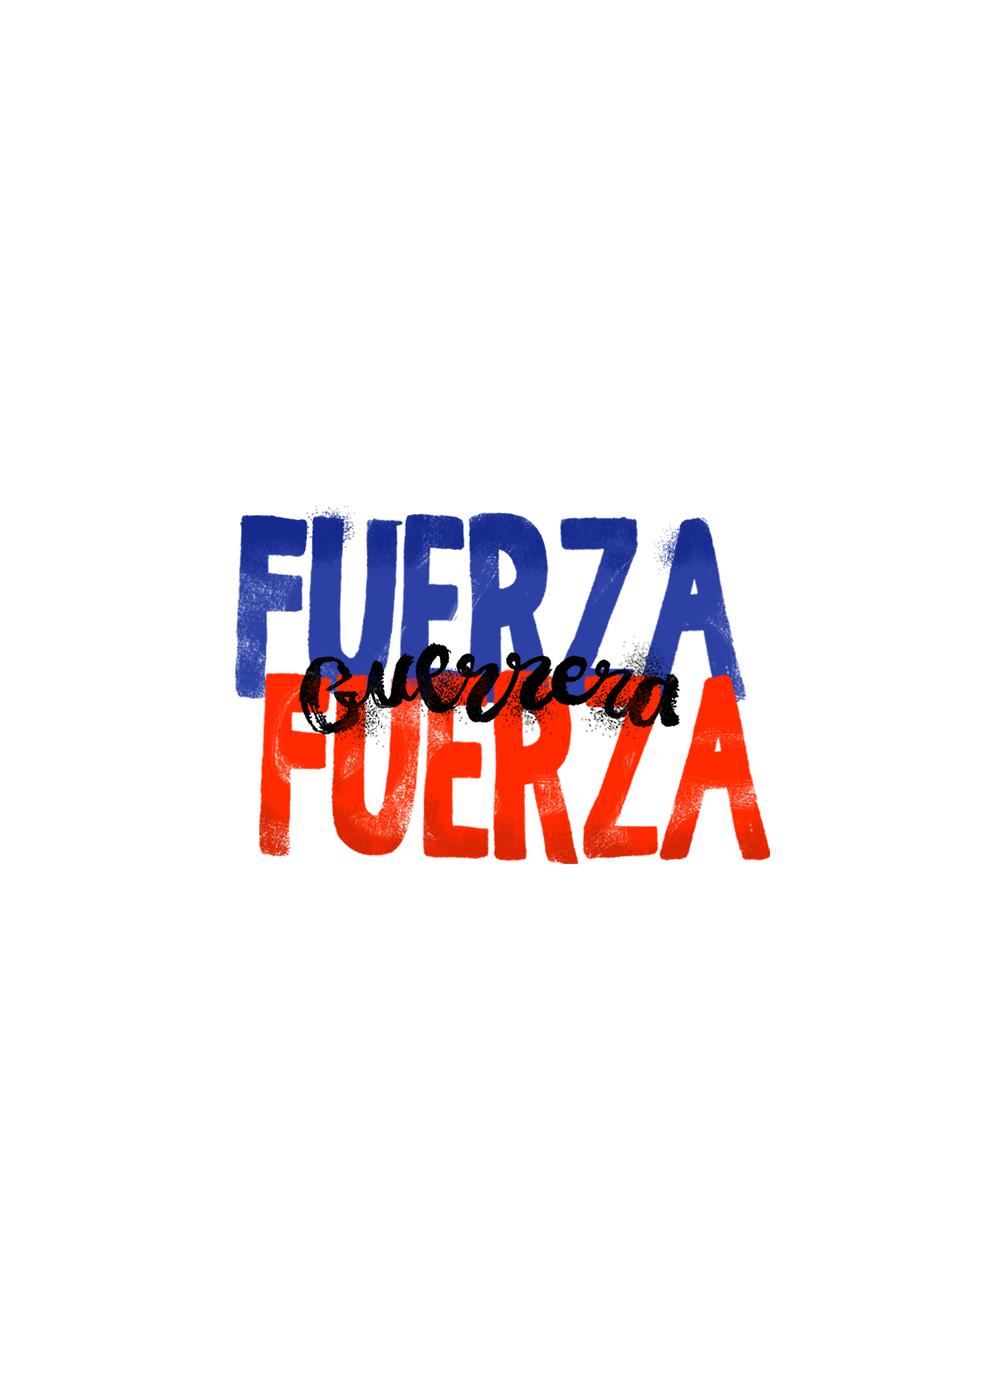 28.FuerzaGuerrera.png